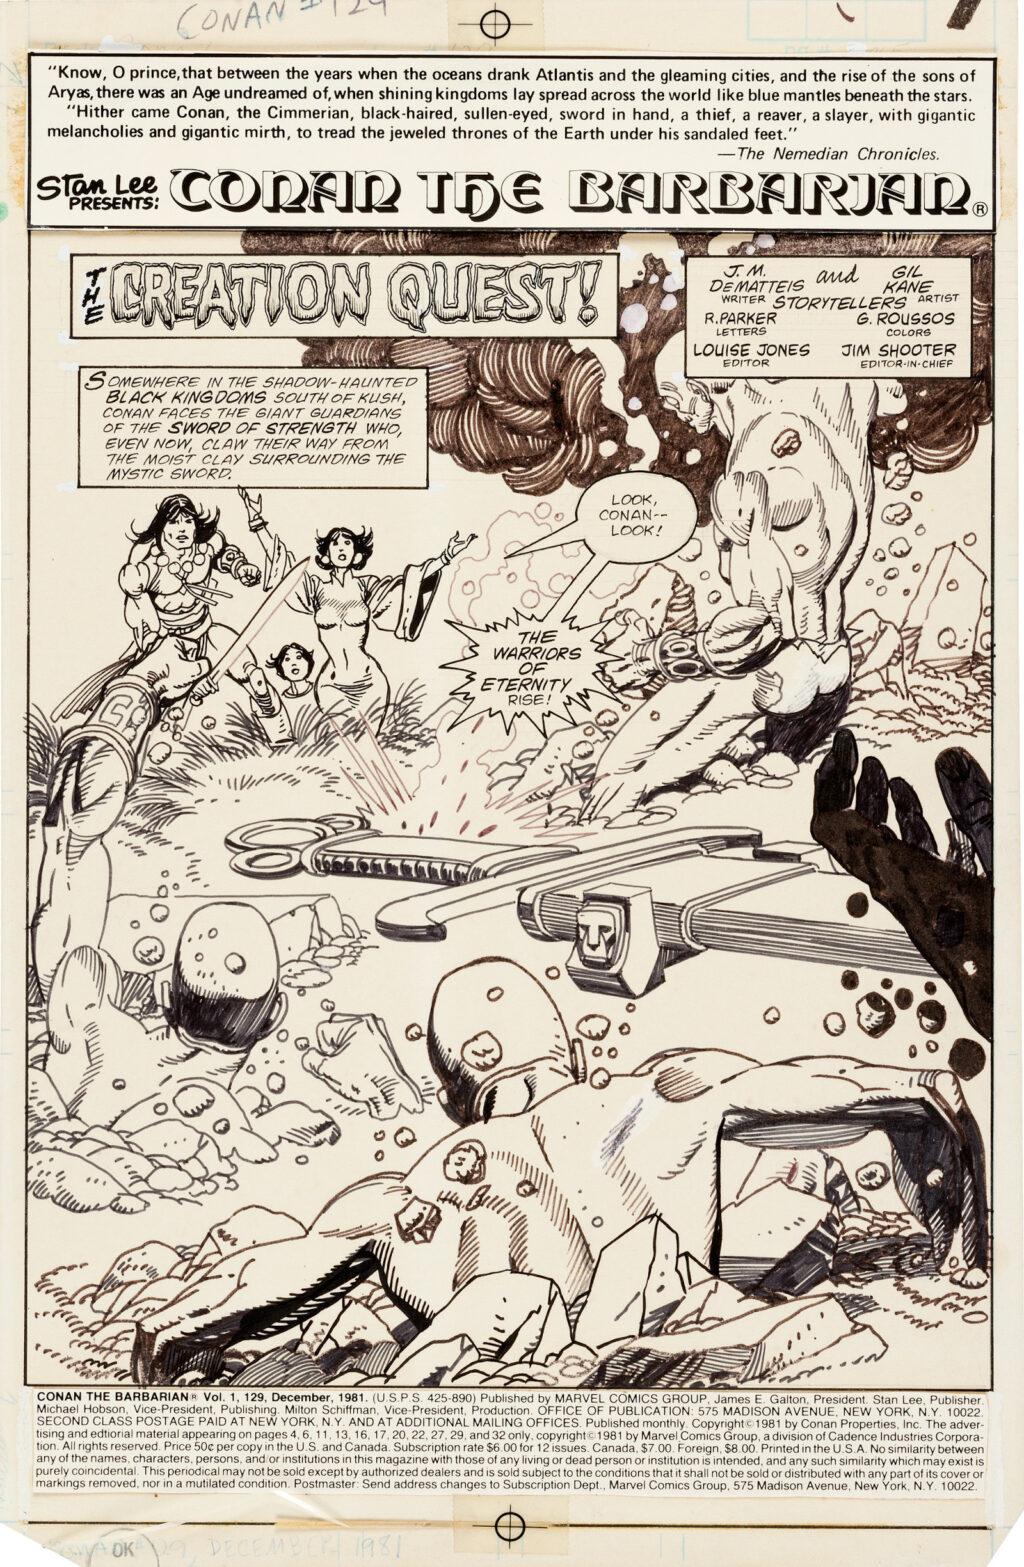 Conan the Barbarian issue 129 splash by Gil Kane